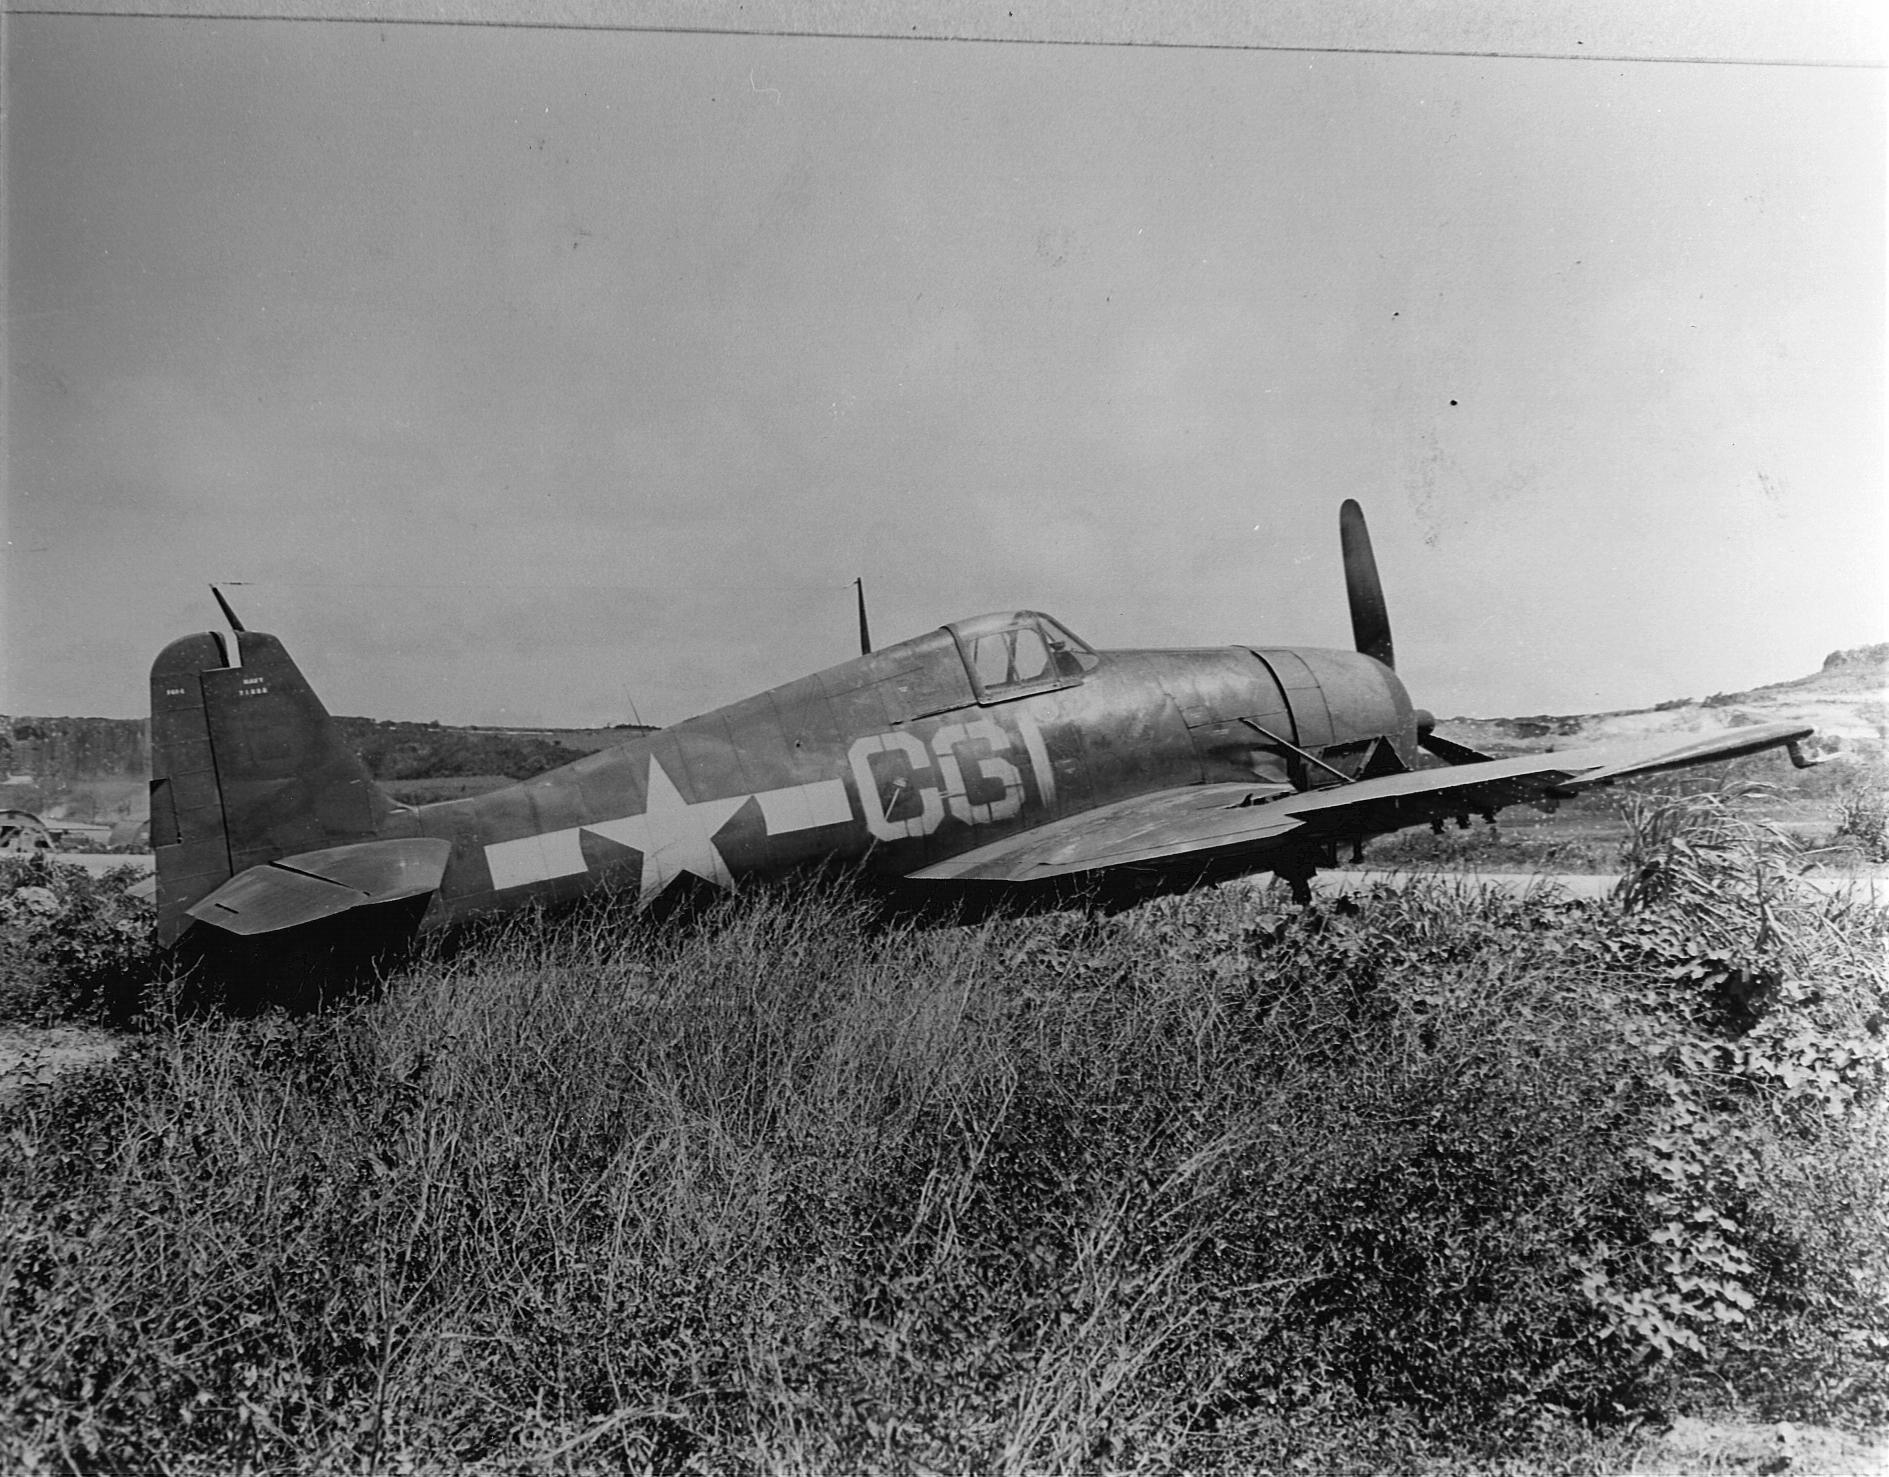 Grumman F6F 5 Hellcat VF 88 Yellow C61 at NAB Marpi Saipan 1945 01